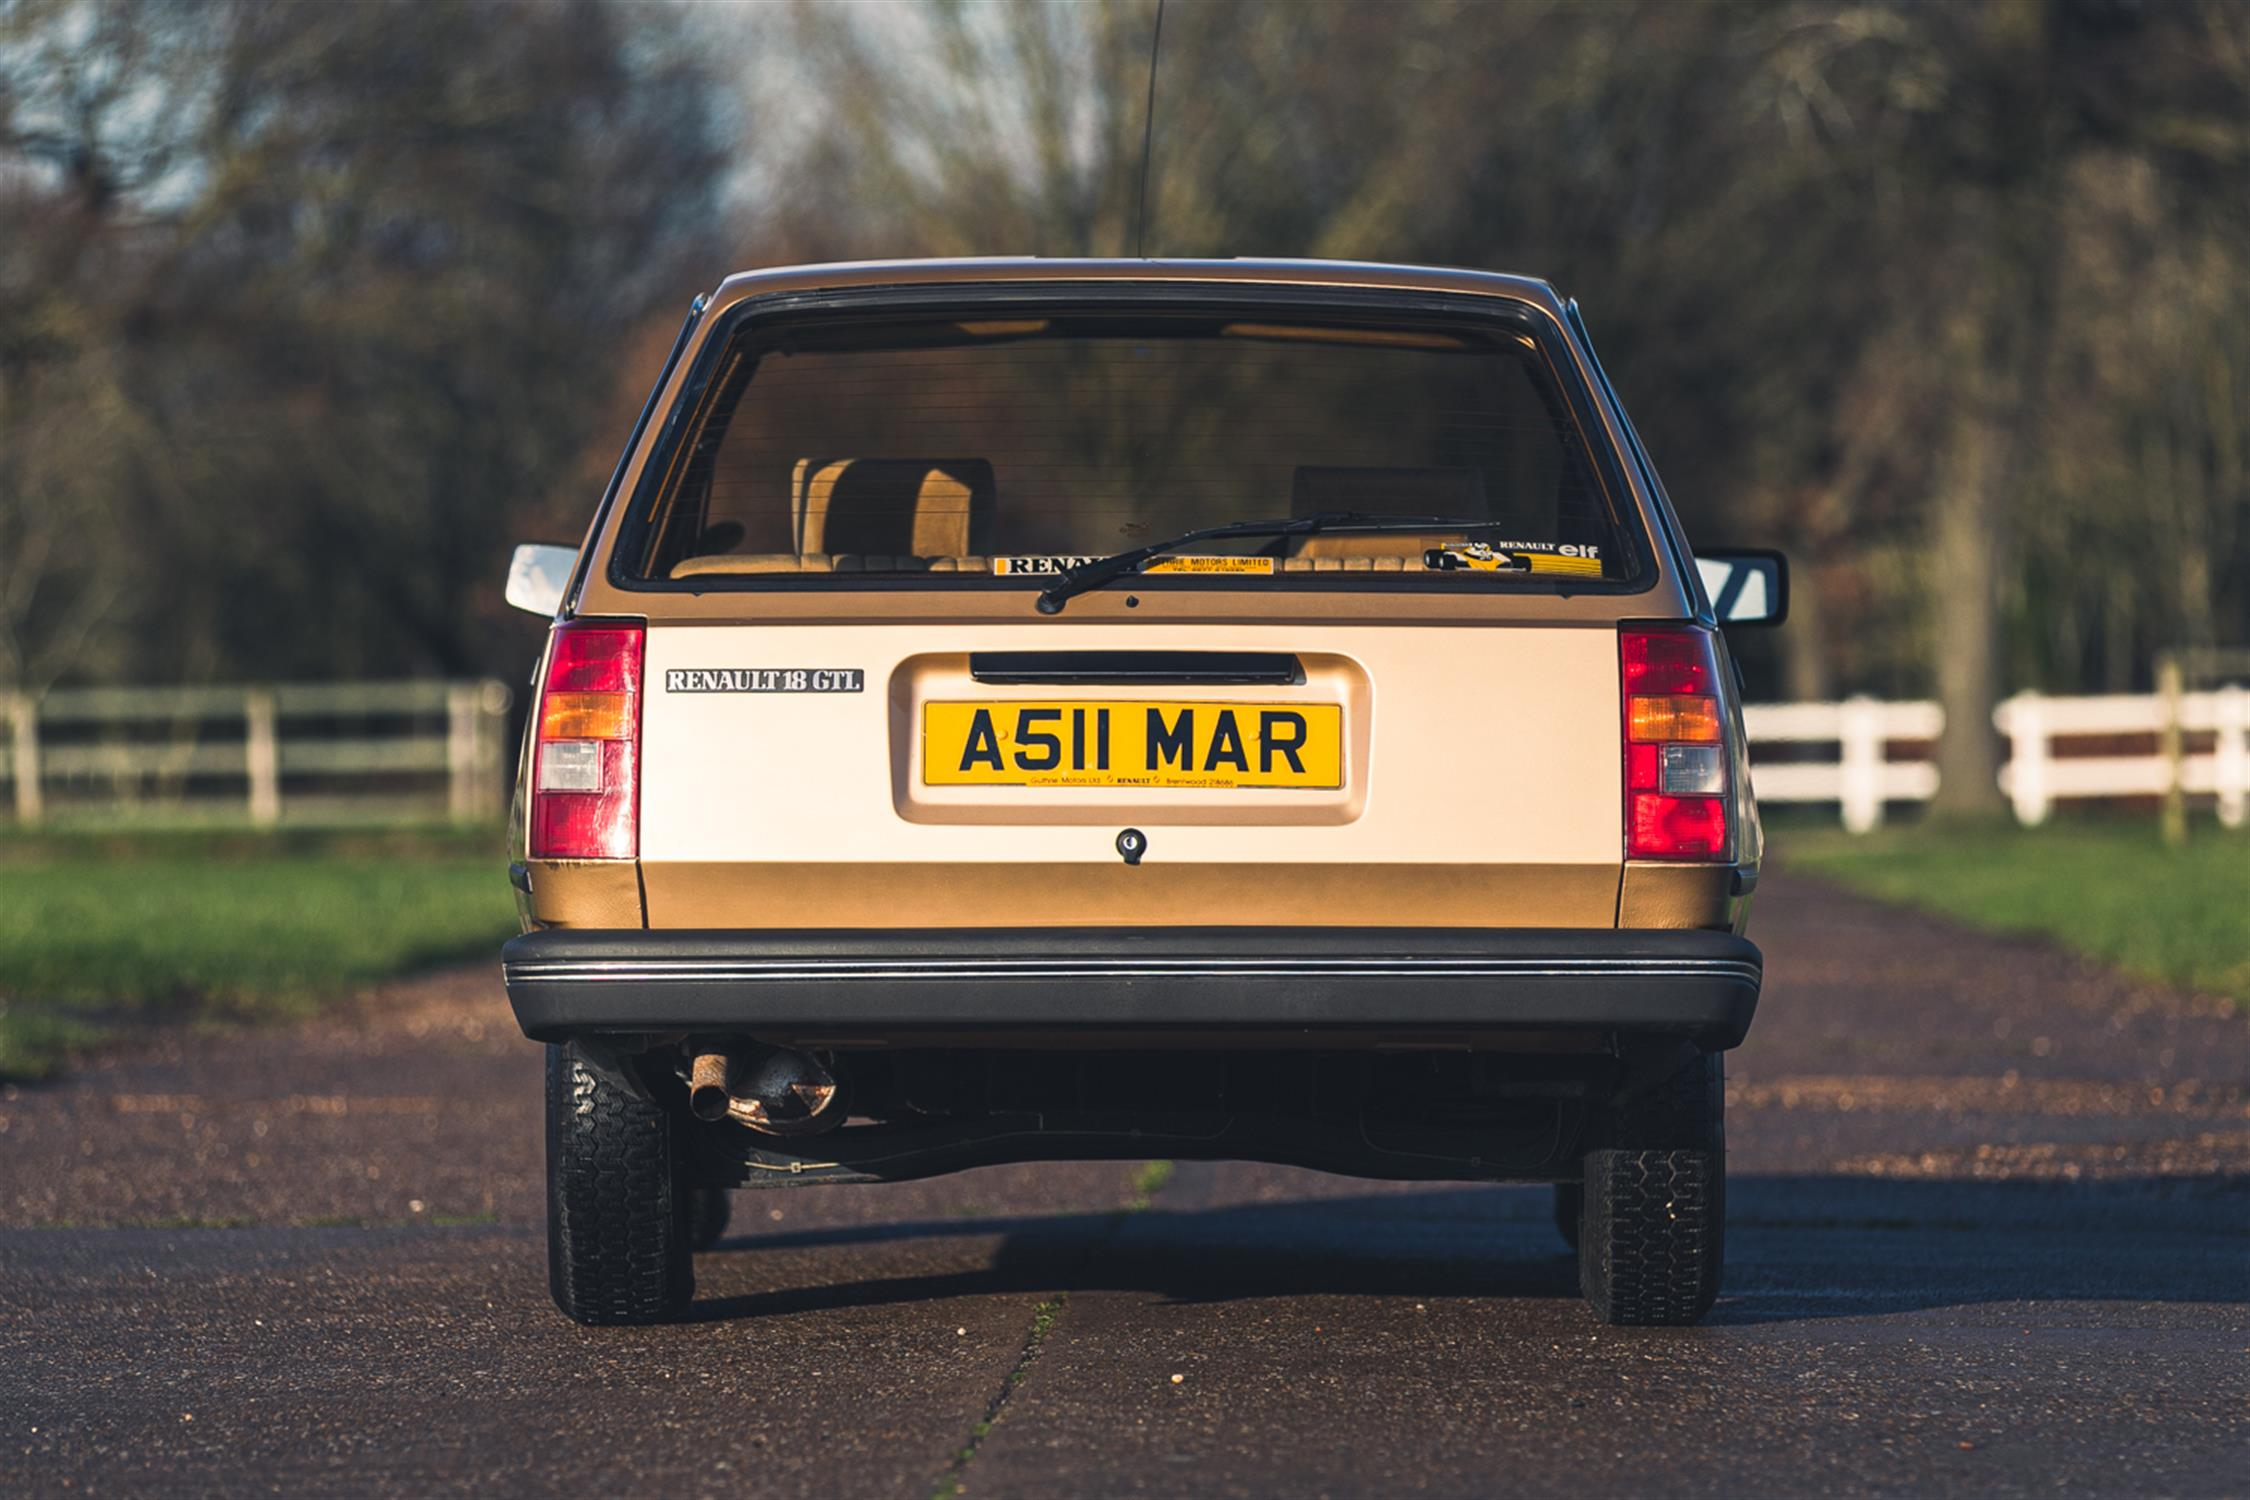 1983 Renault 18 GTL Estate - Image 20 of 32